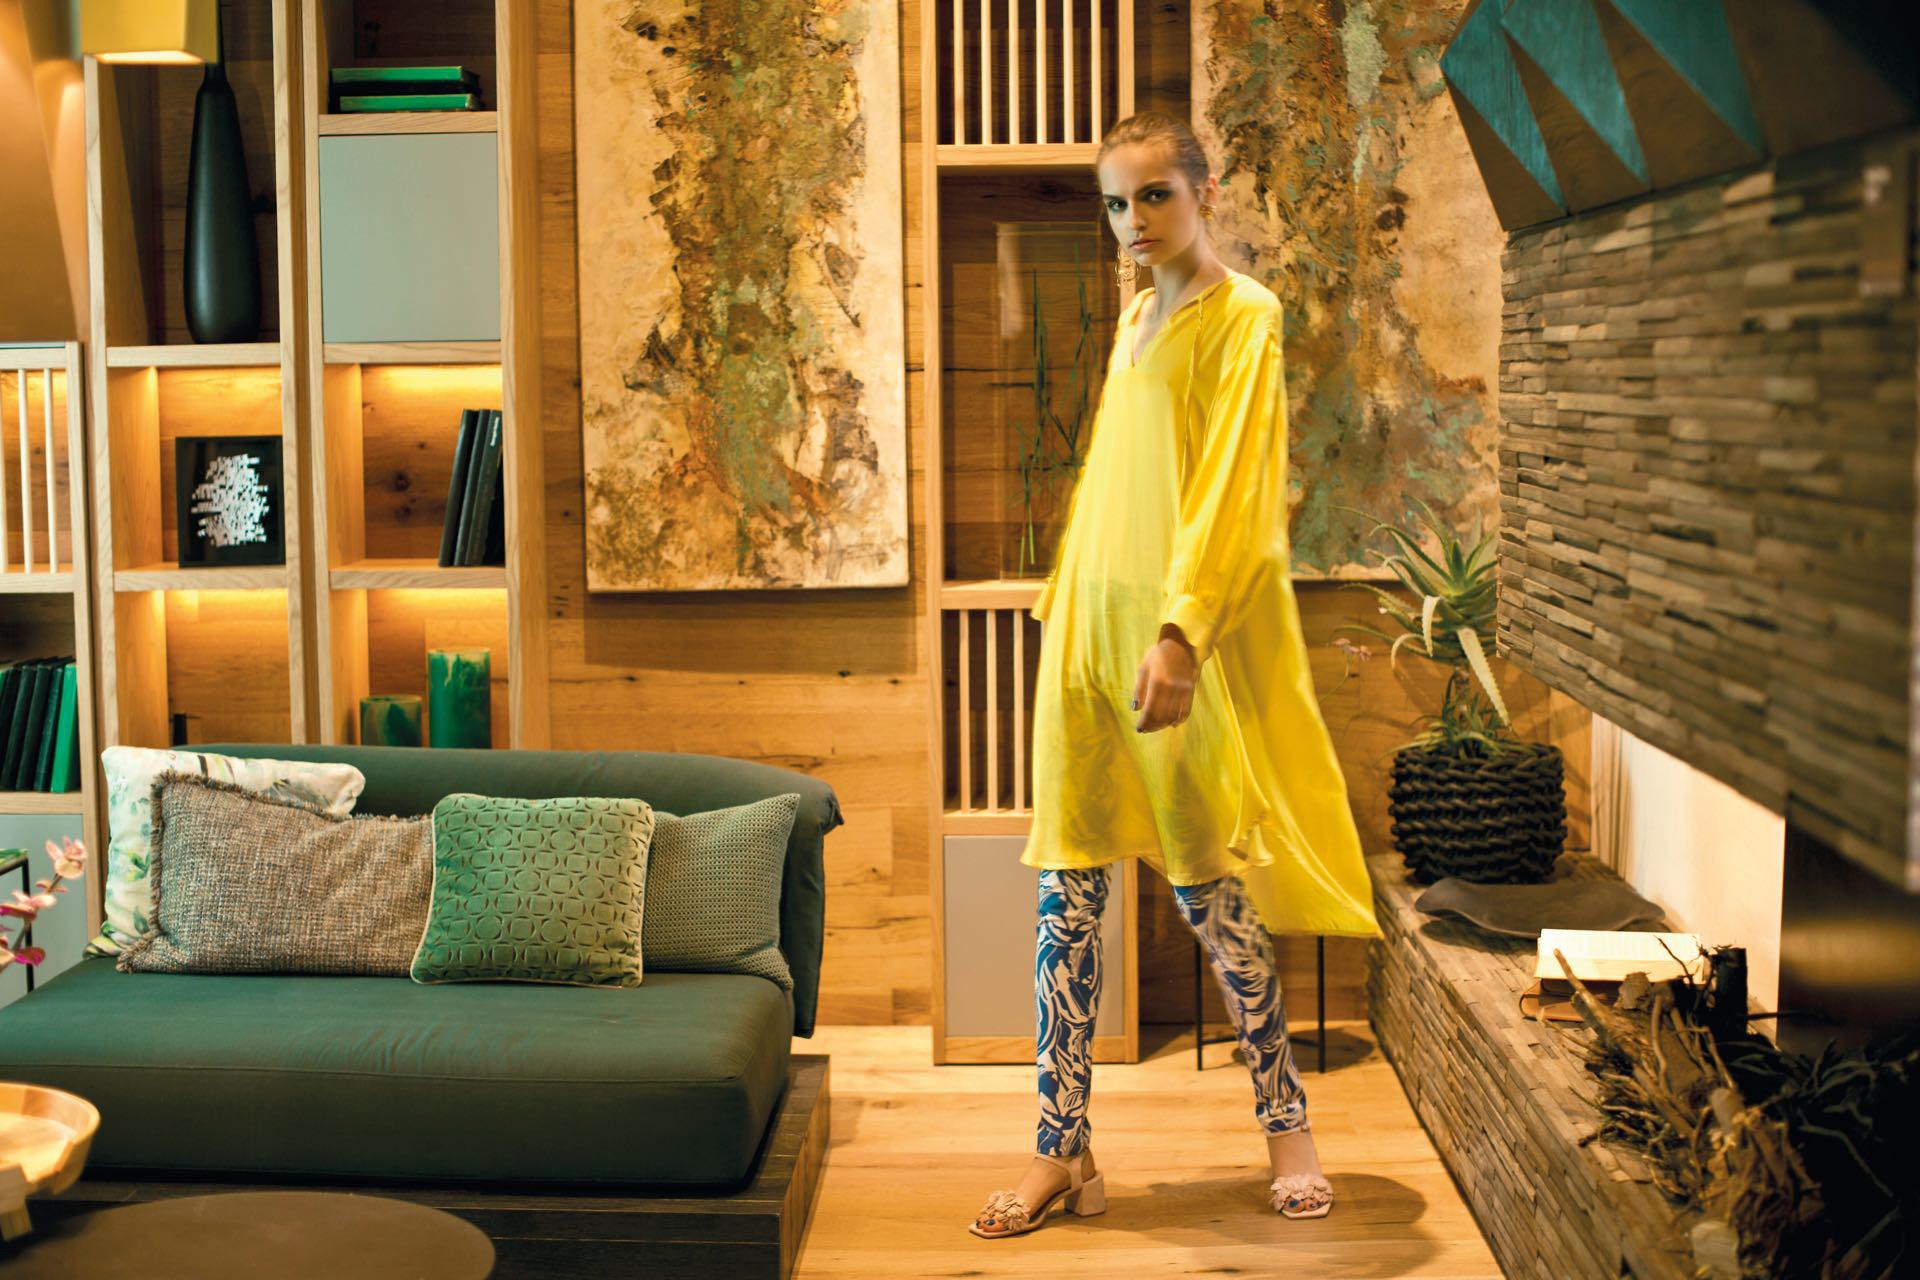 Túnica larga de seda (Cher), pantalón estampado (Ayres) y sandalias de gamuza ($ 5.900, Saverio Di Ricci).